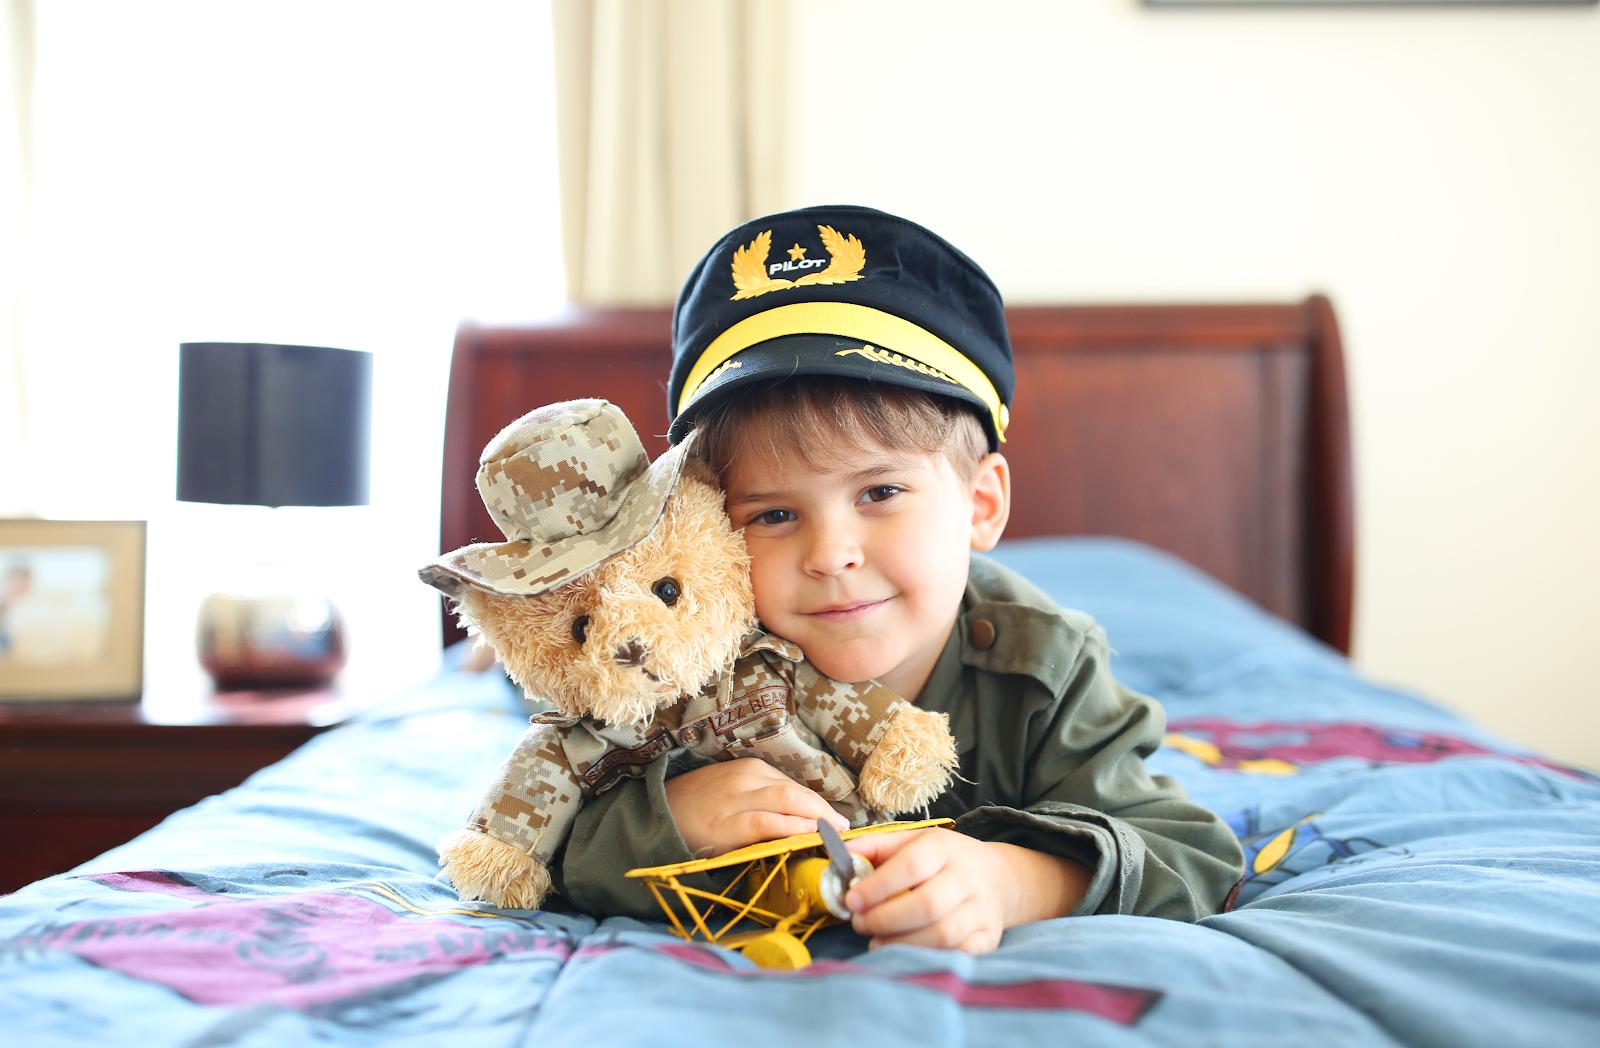 how-i-built-a-teddy-bear-business-helping-military-kids-sleep-at-night